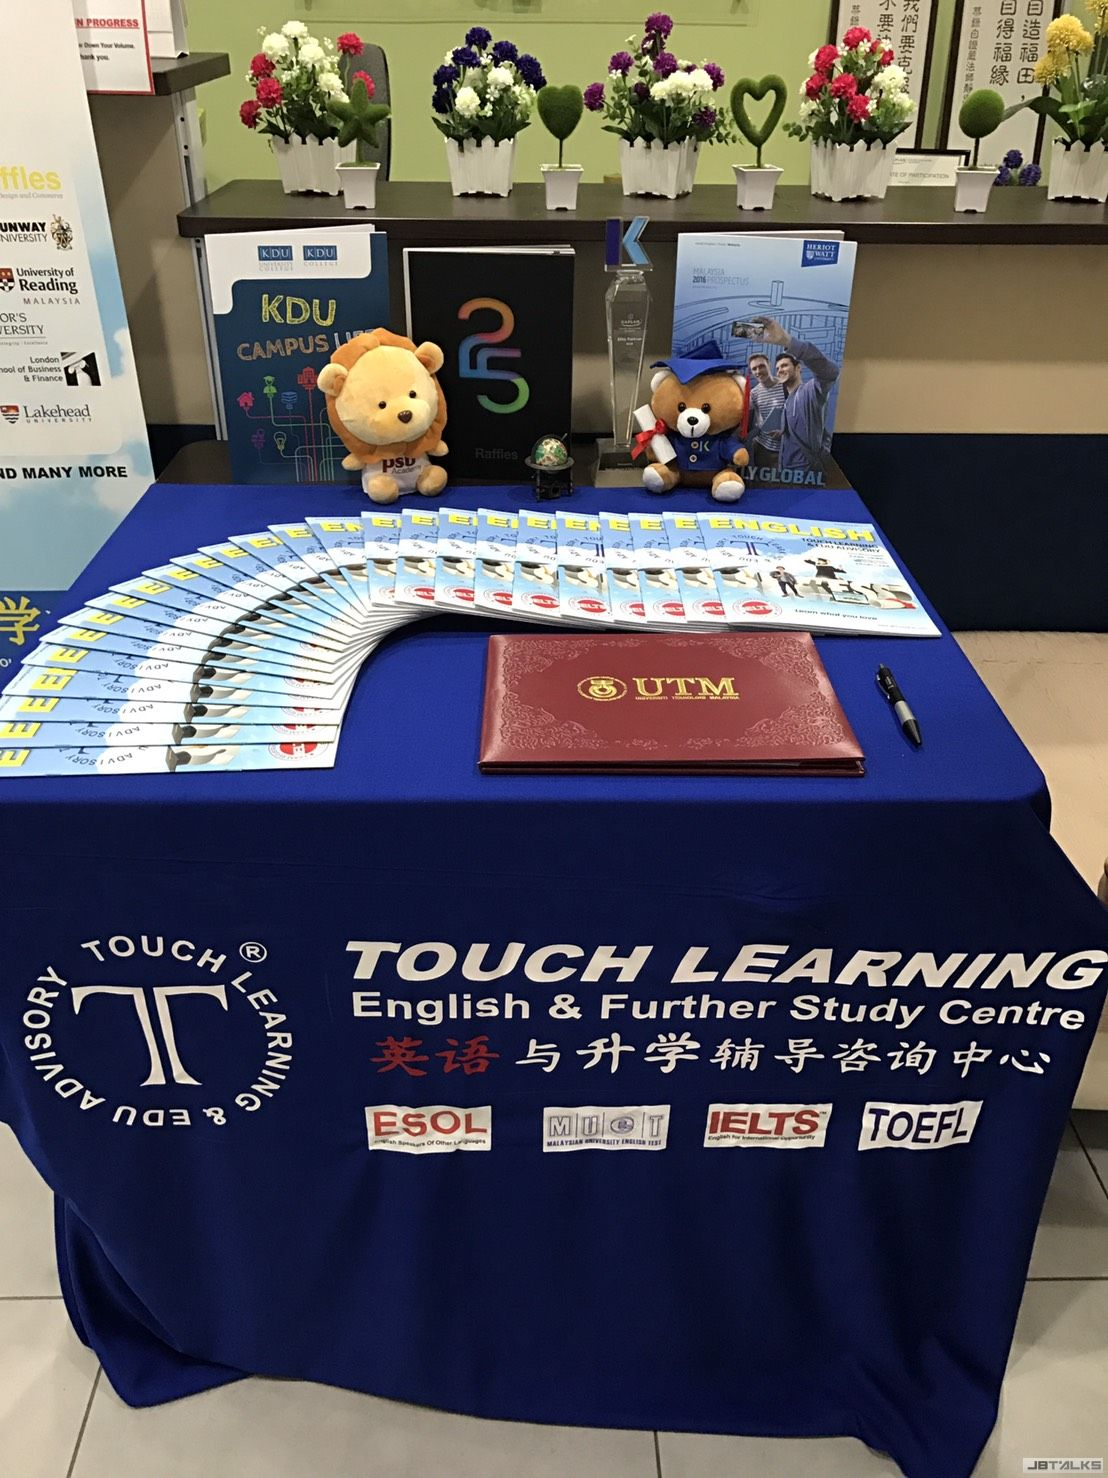 Touch Learning_升学辅导_热门科系.jpg